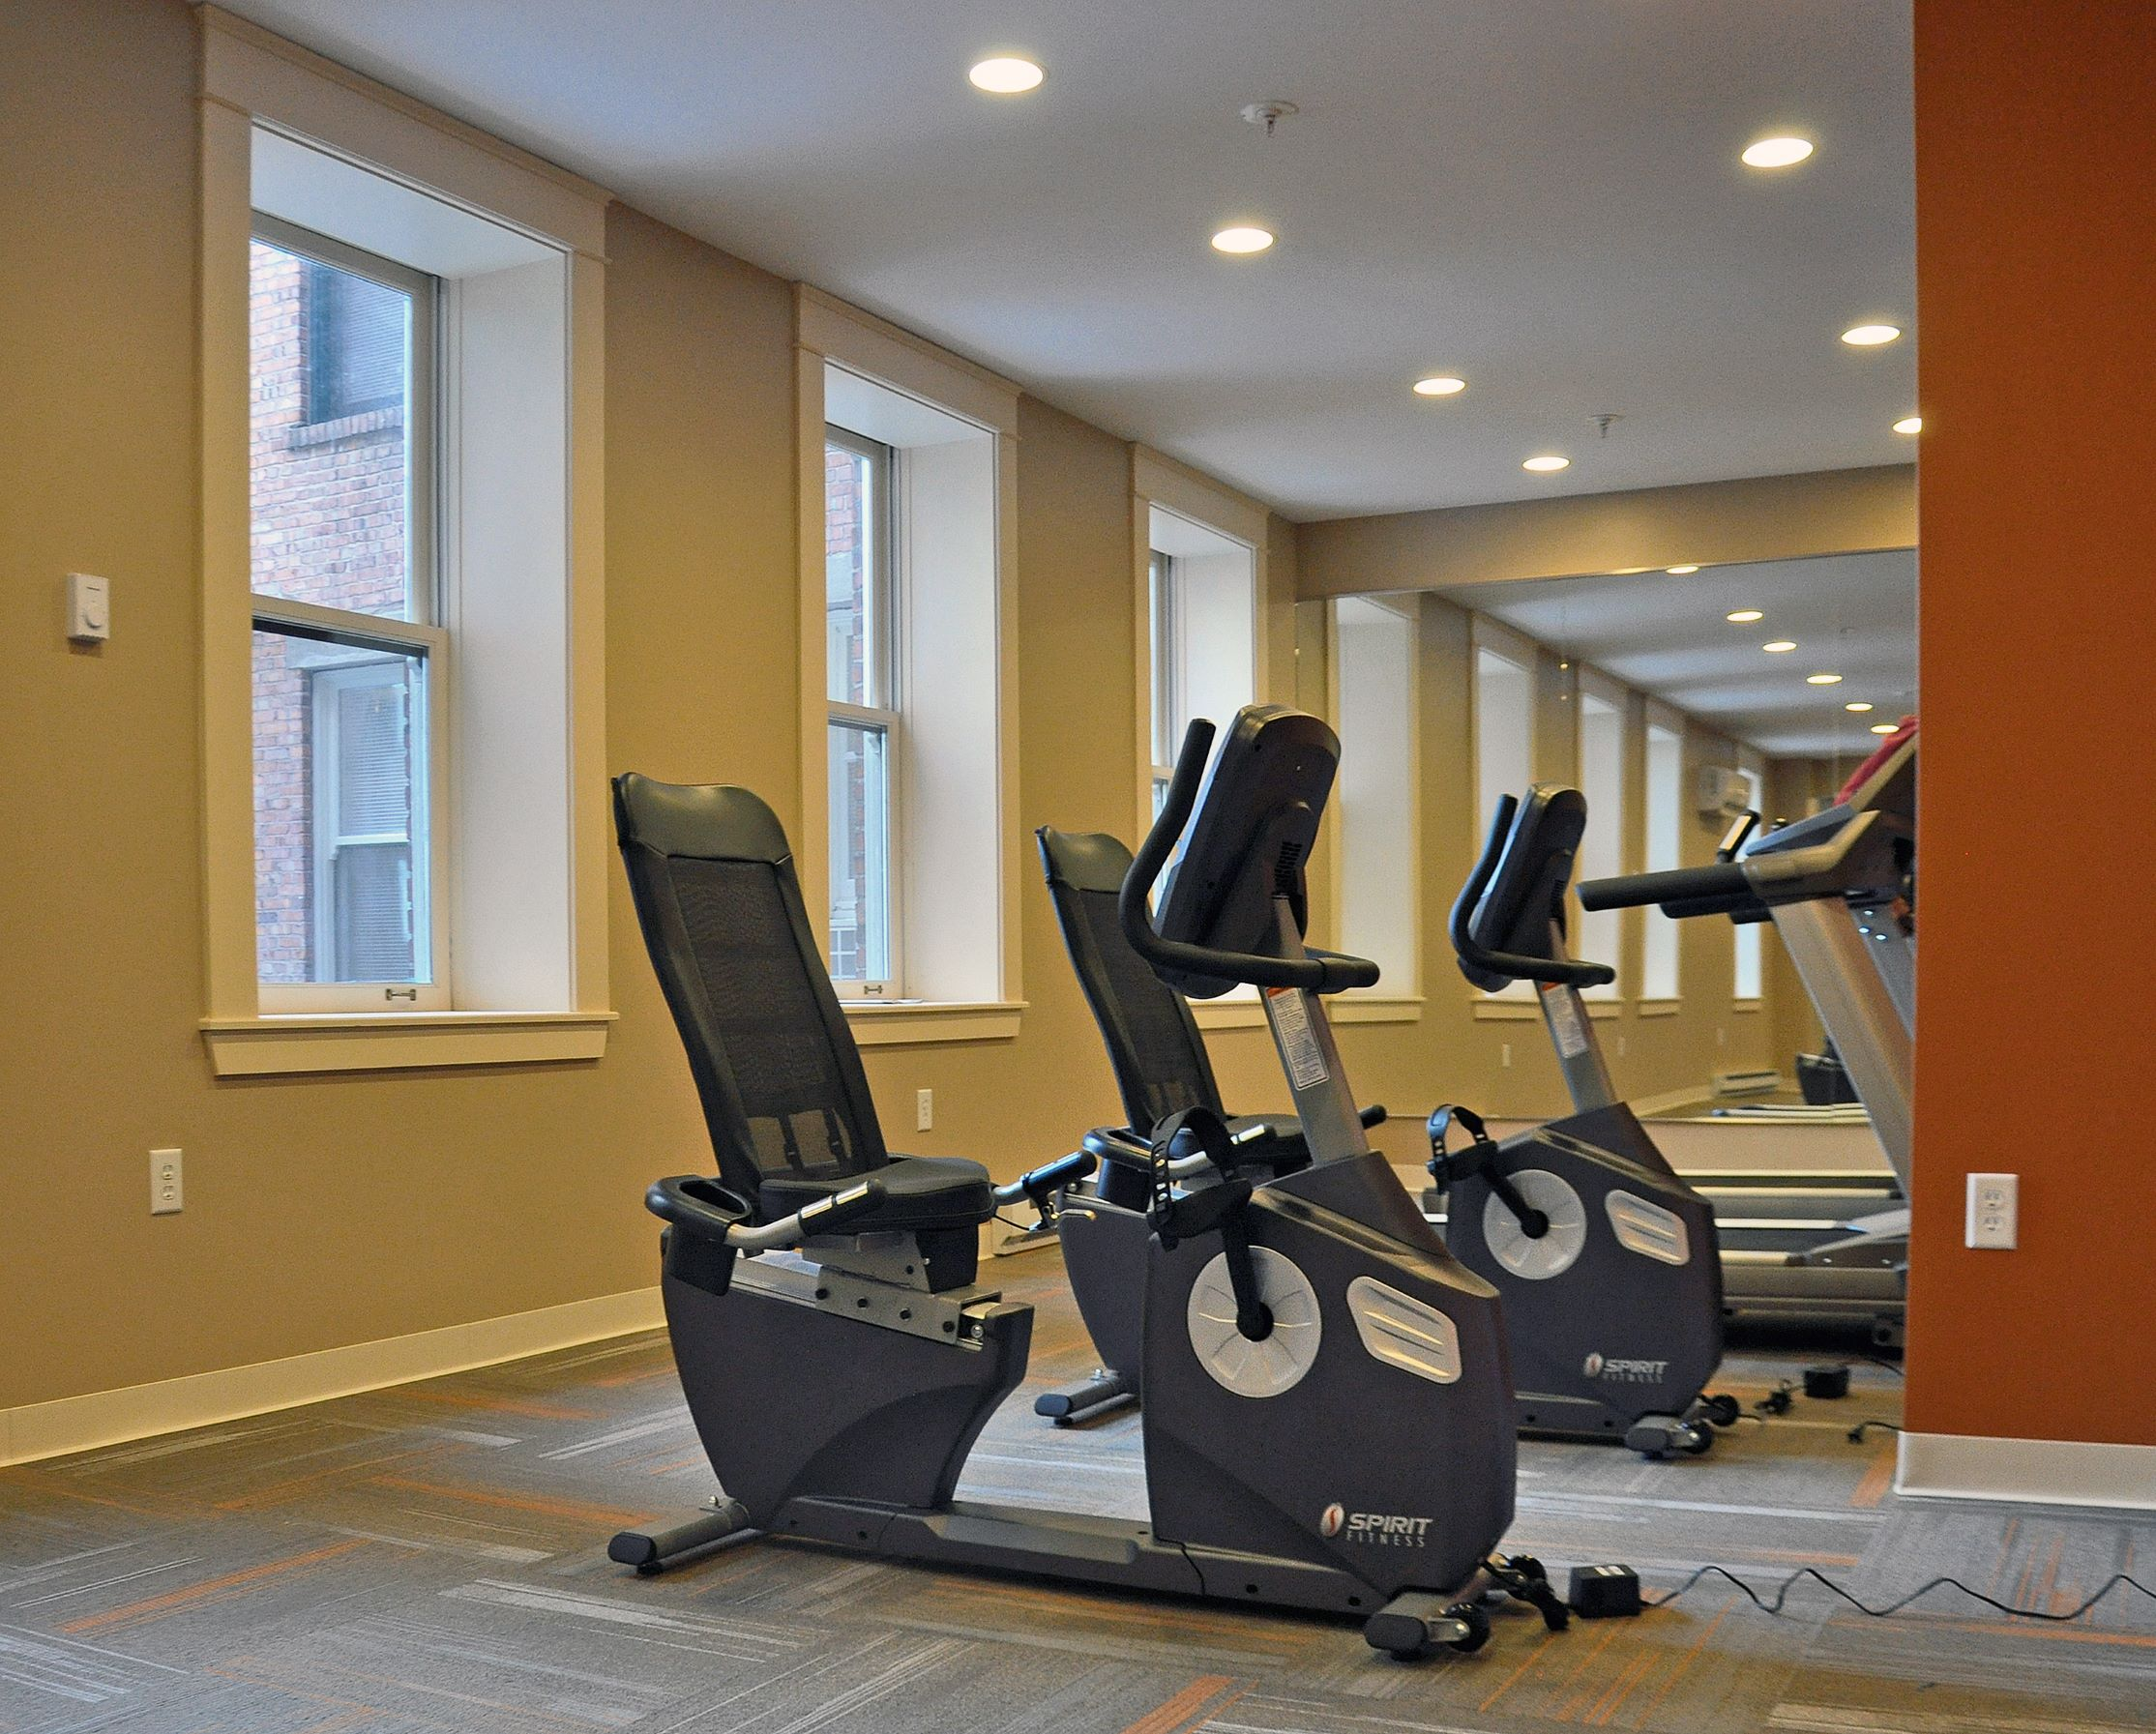 The Burlington Fitness Center